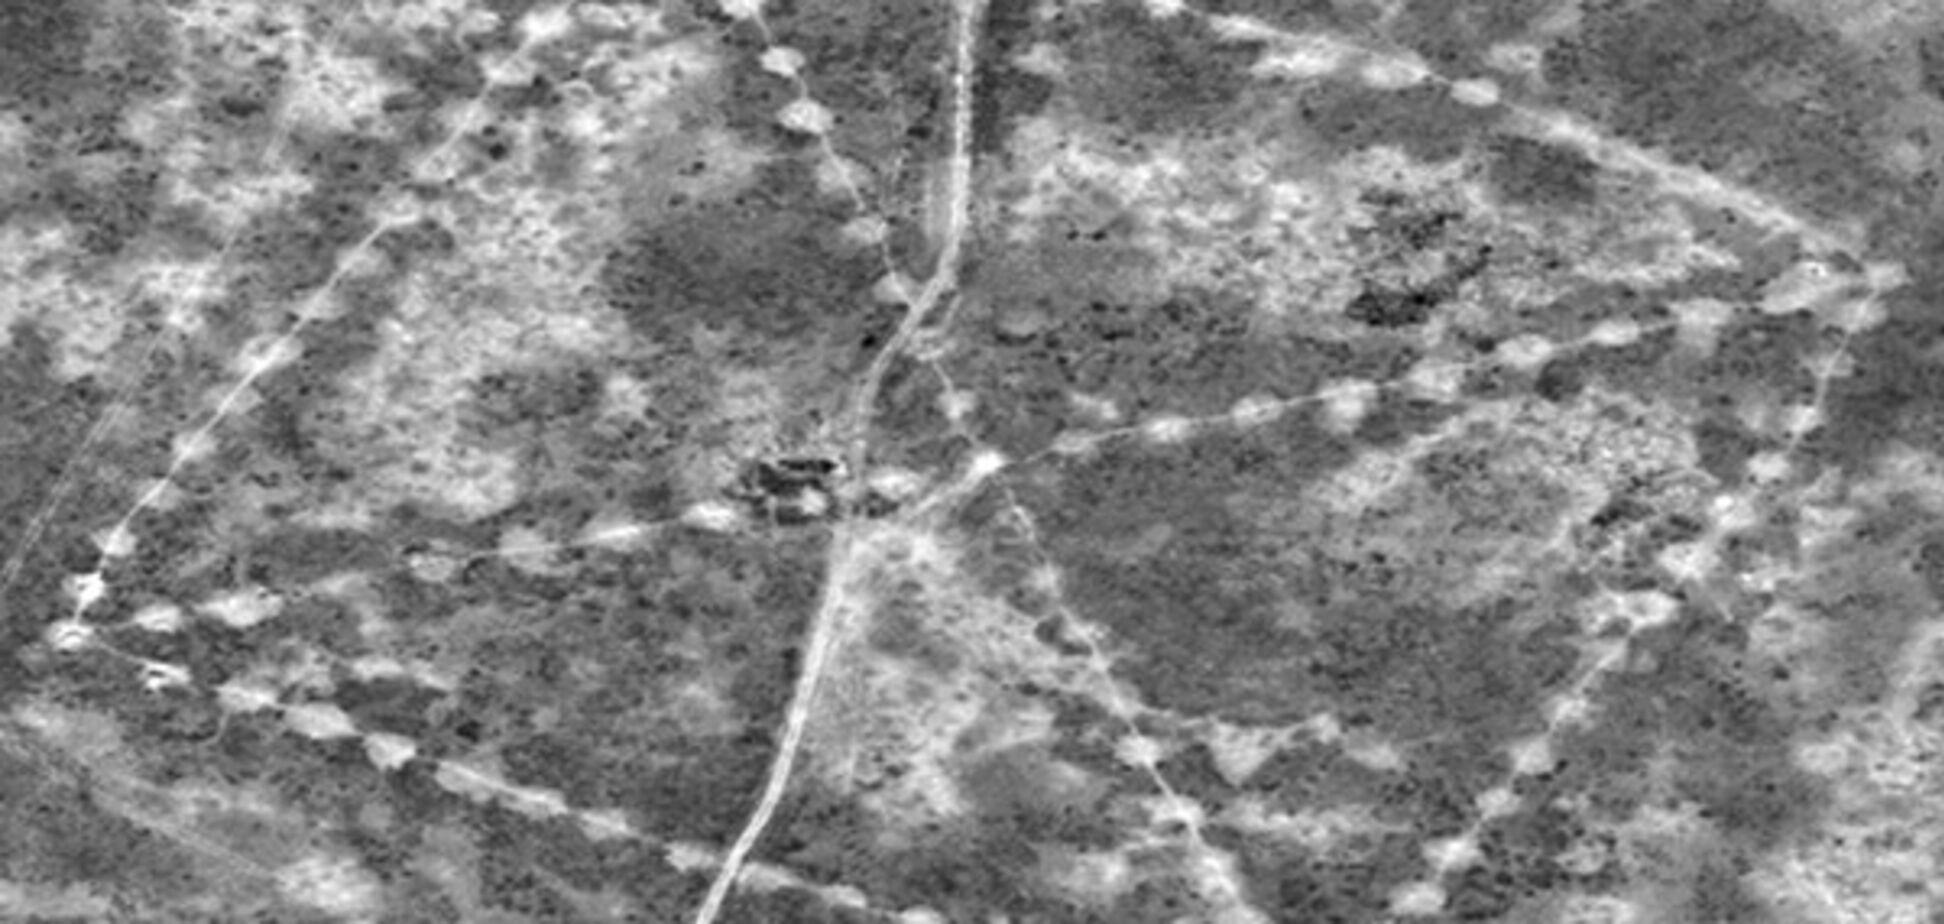 NASA обнаружило в Казахстане древнюю свастику: фотофакт